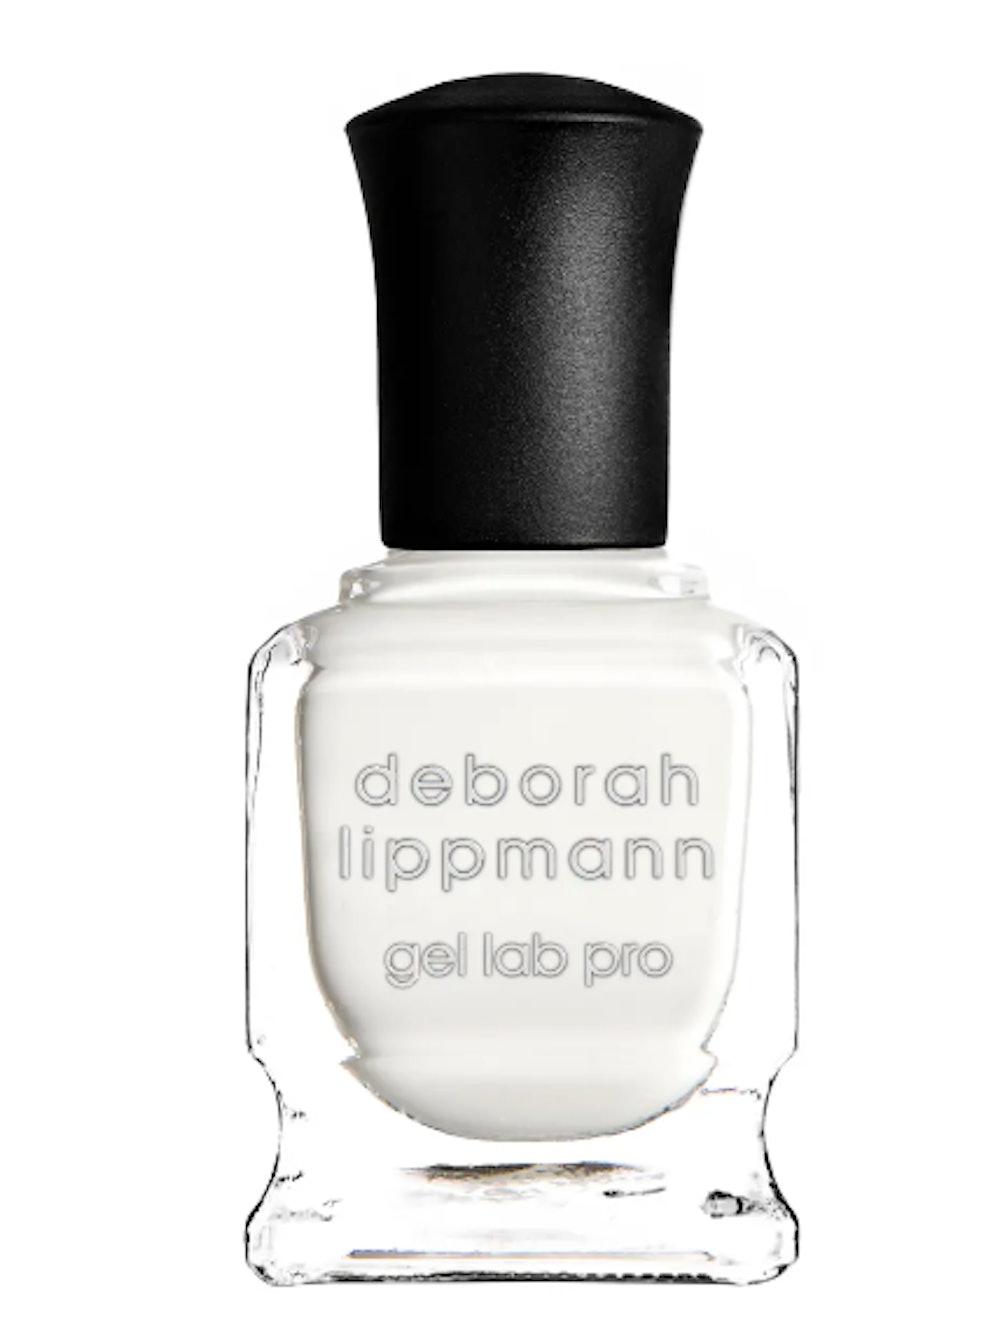 Deborah Lipman Never, Never Land Gel Lab Pro Nail Color